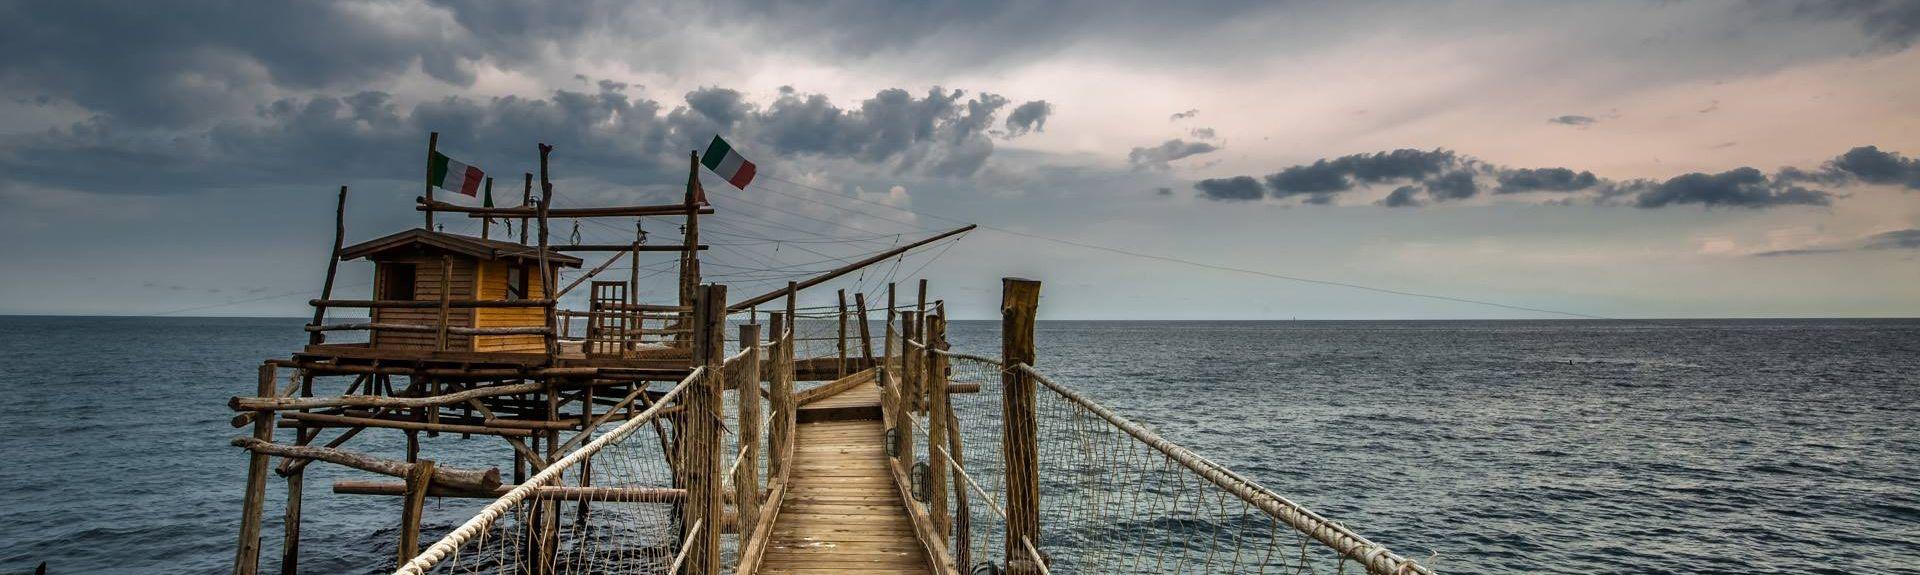 Chieti (provincia), Abruzos, Italia